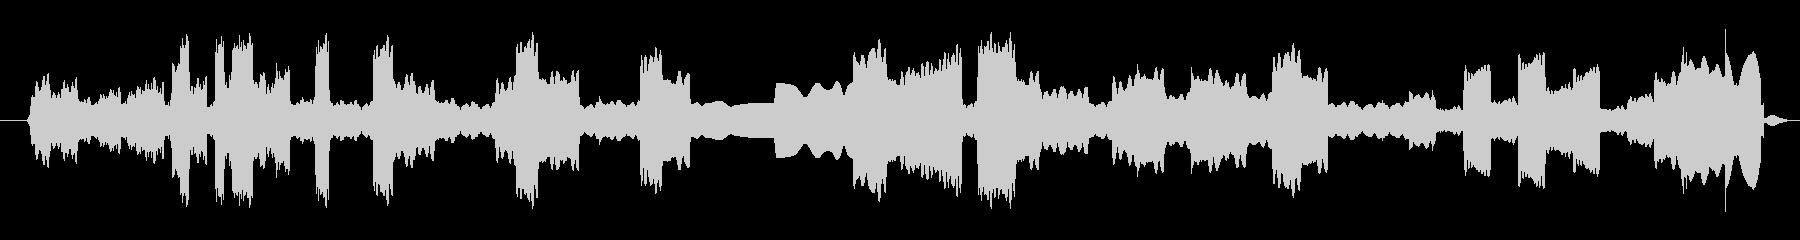 FX トーキングロボット04の未再生の波形